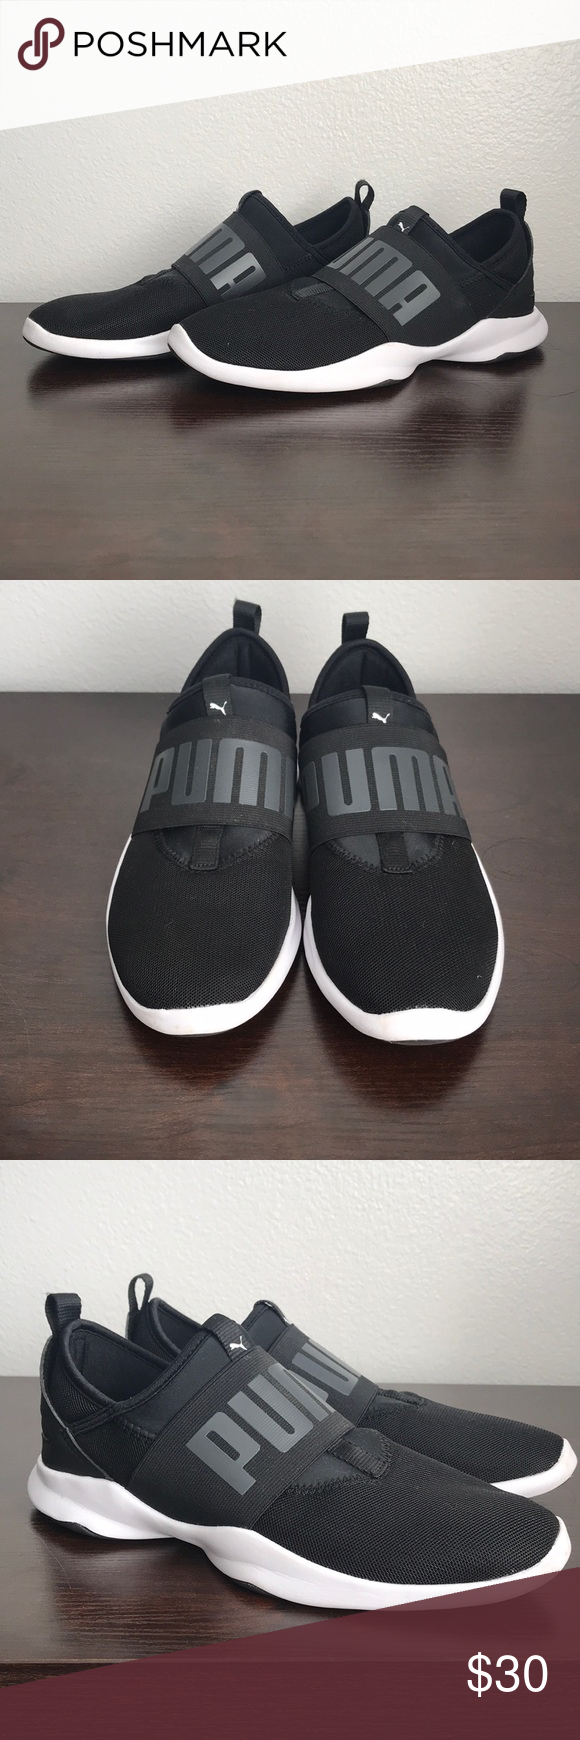 PUMA shoes Black and white puma shoes